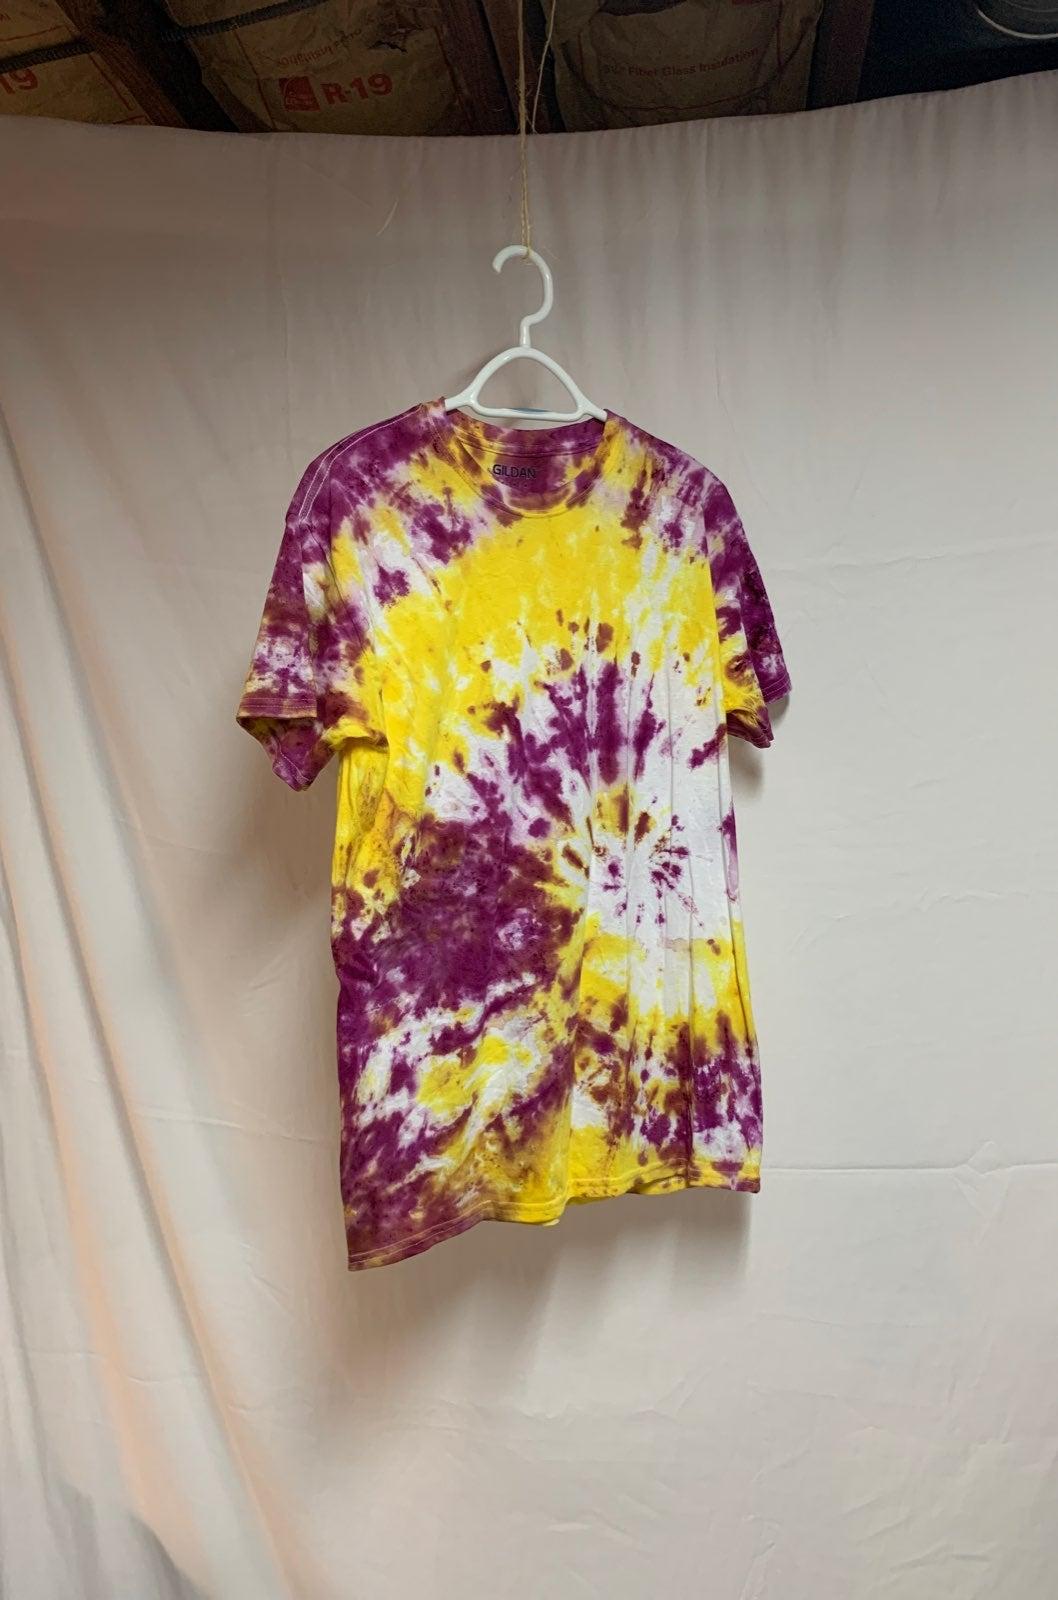 Purple and Yellow Tie Dye Shirt